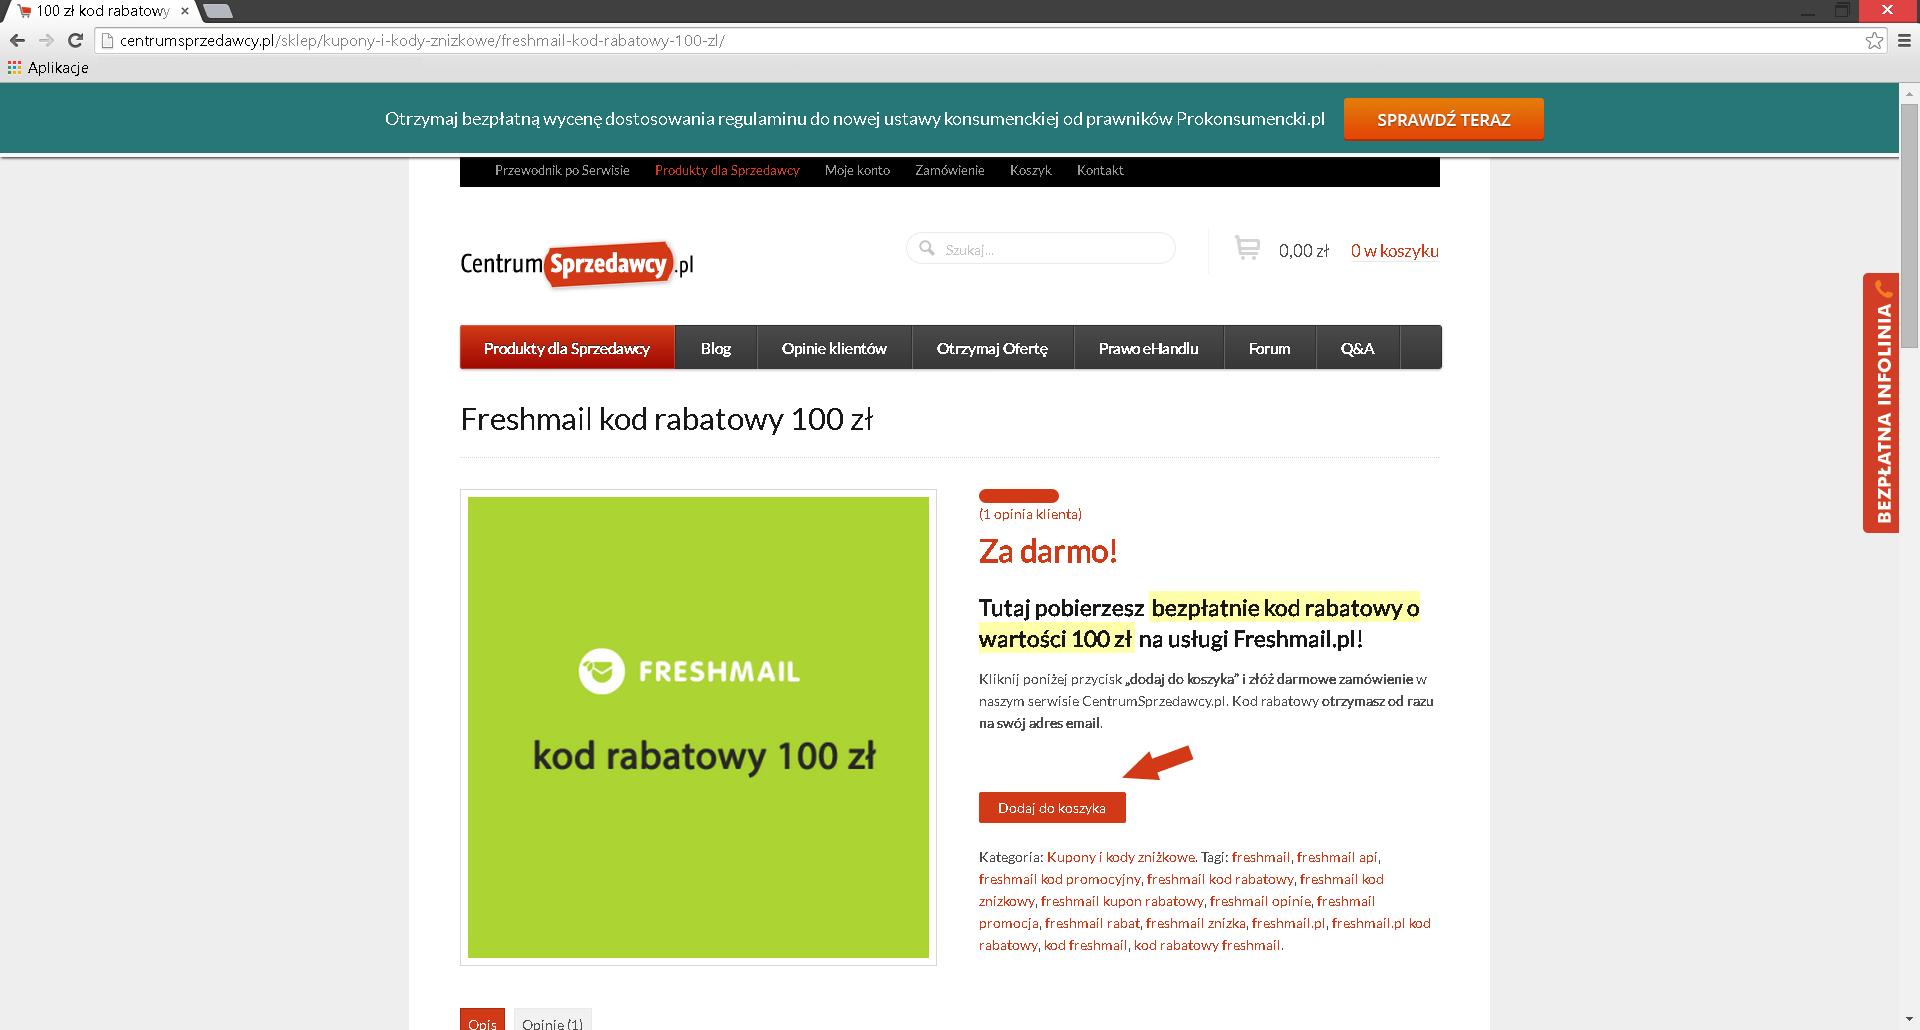 freshmail kod rabatowy, freshmail kod promocyjny, kod promocyjny freshmail,